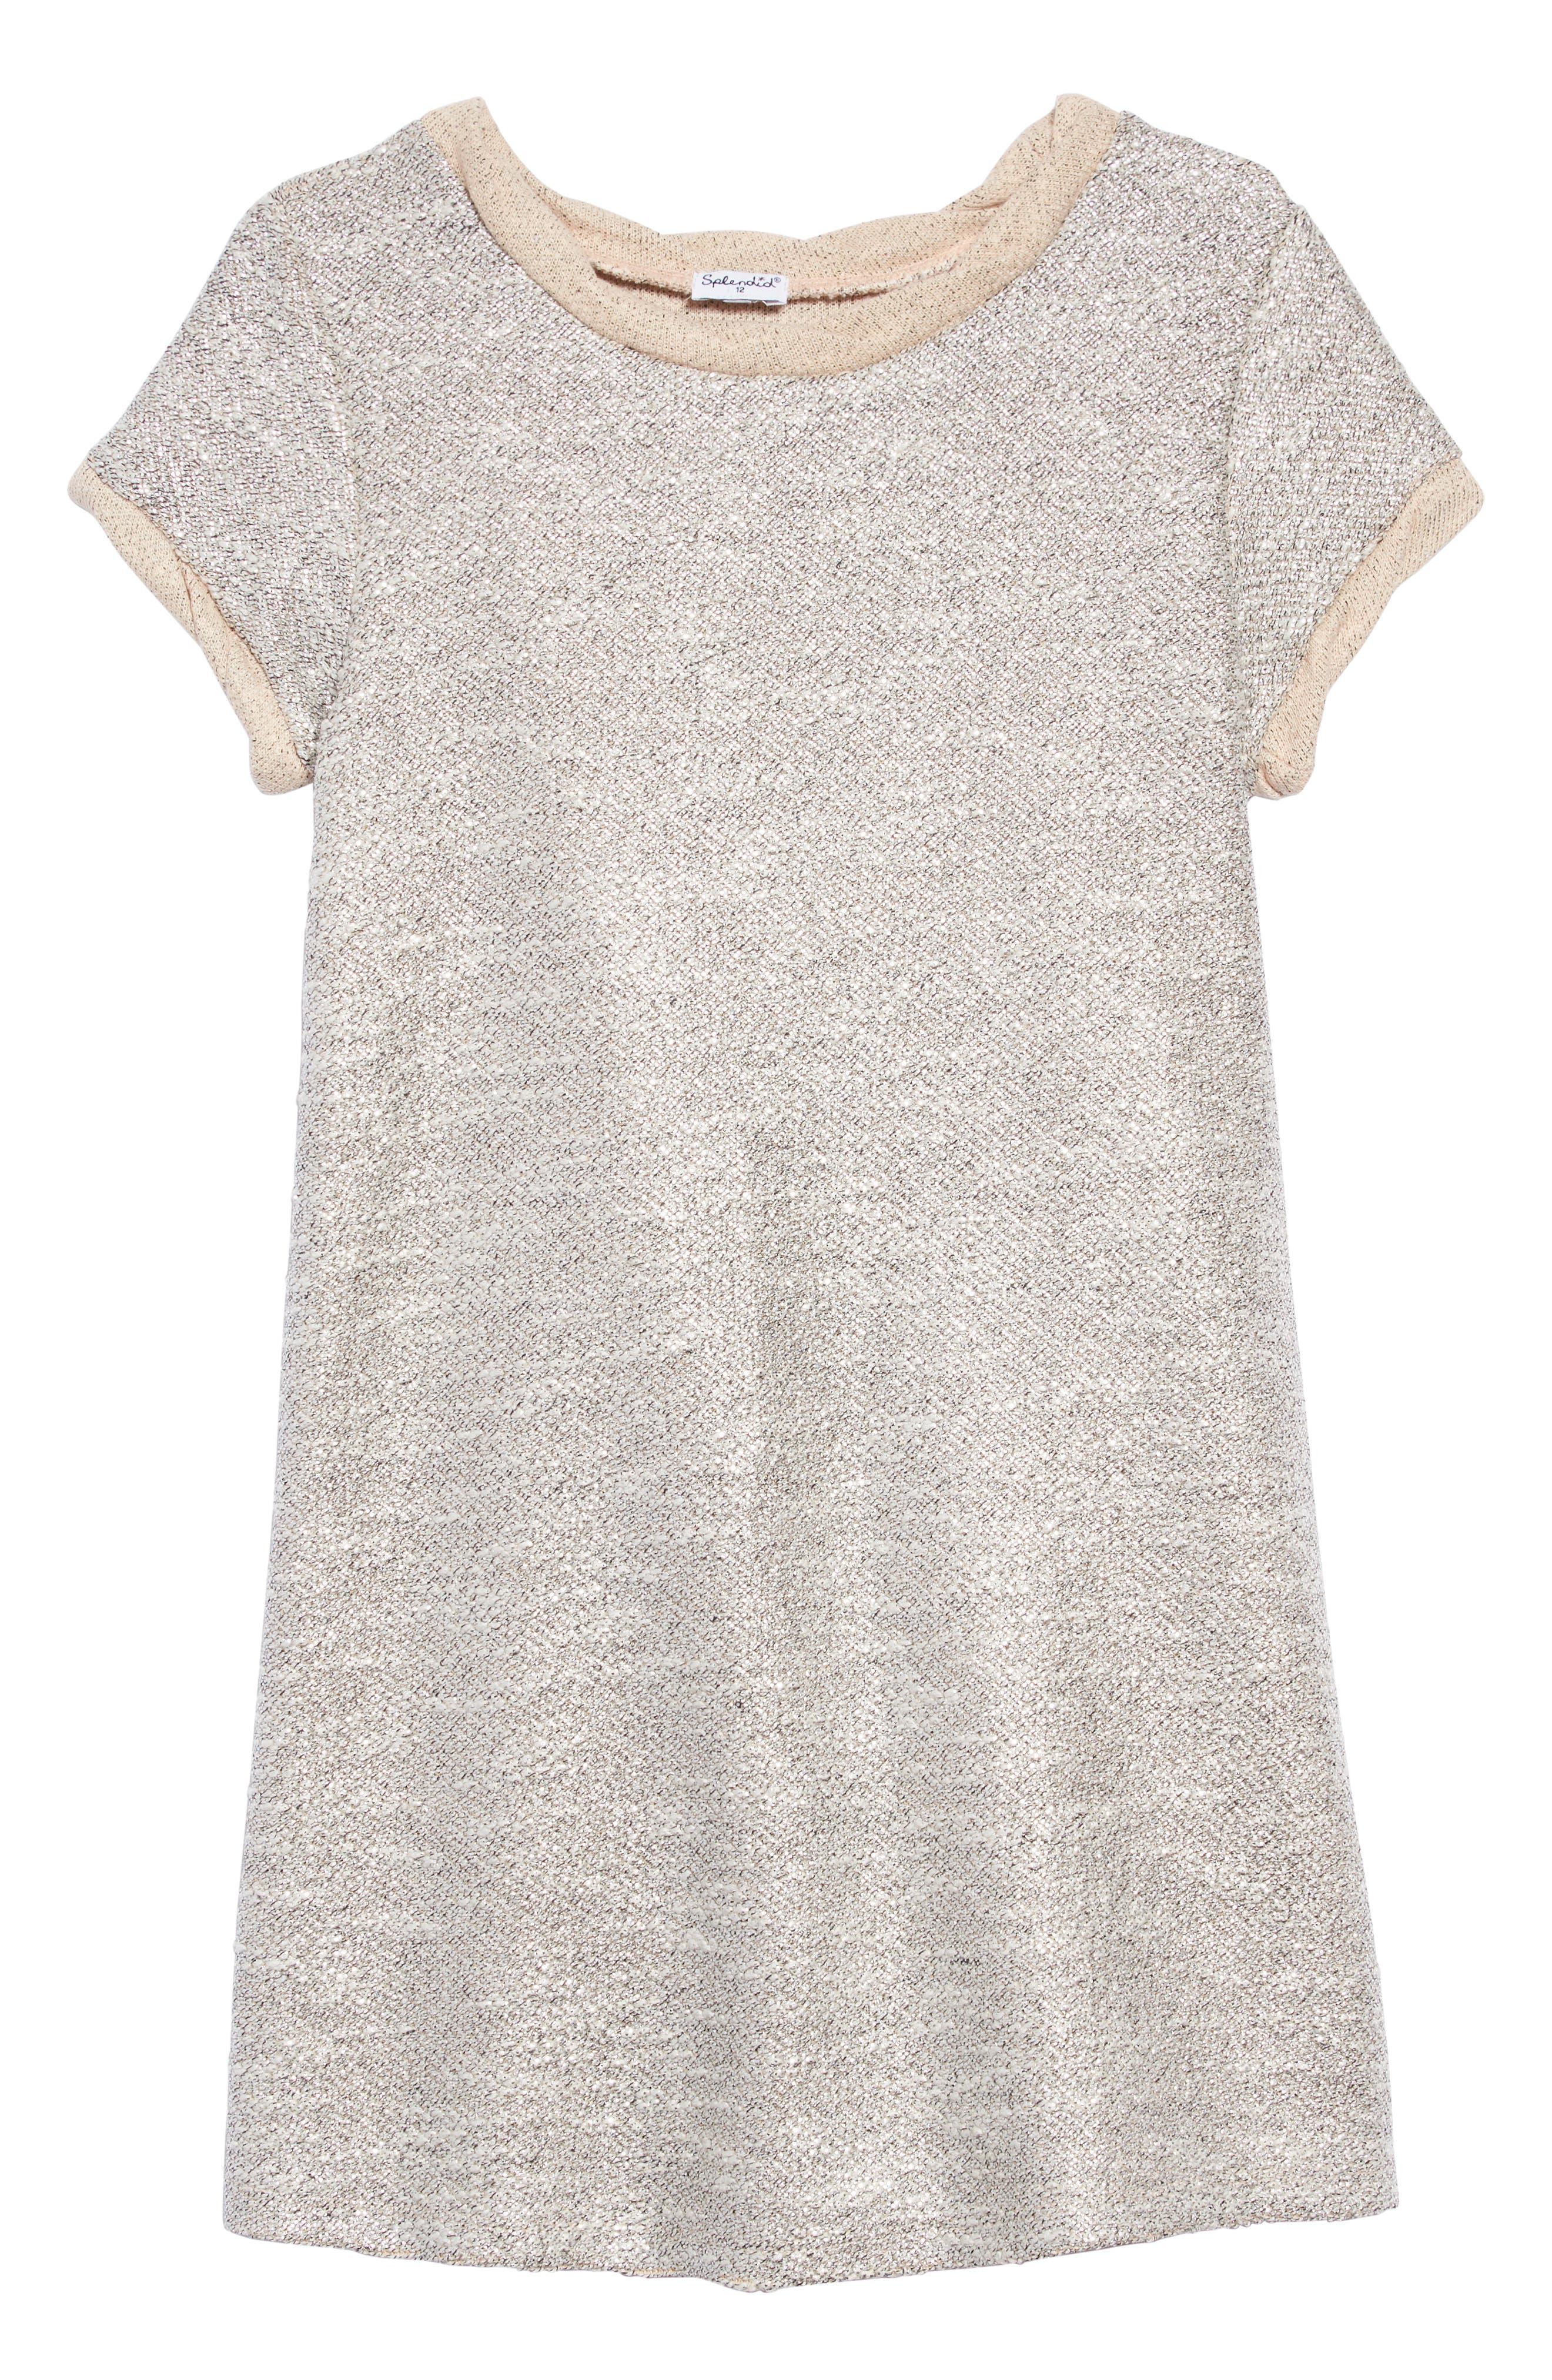 Metallic Shimmer Dress,                         Main,                         color, PALE DOGWOOD